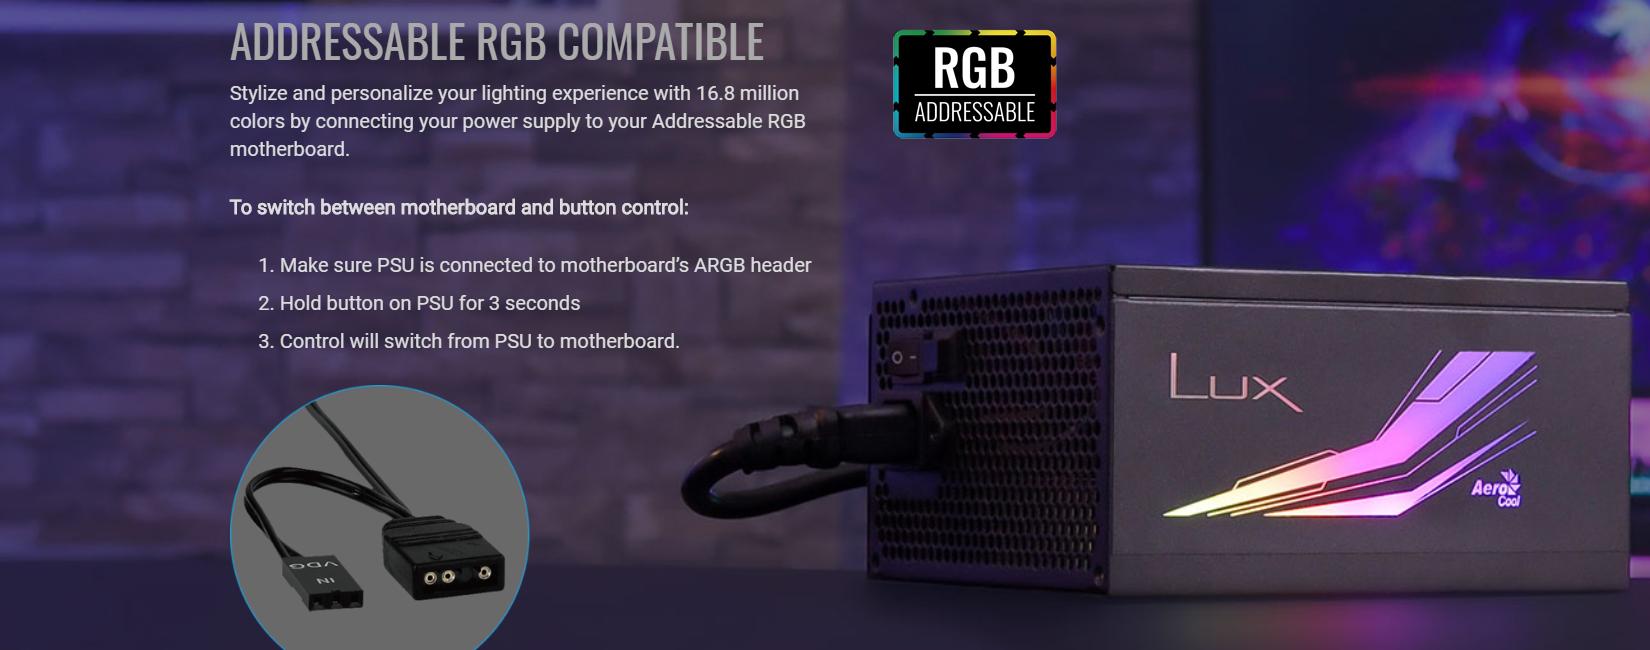 guồn Aero Cool Lux RGB 550W ( 80 Plus Bronze/Màu Đen/Led RGB) RGB sync